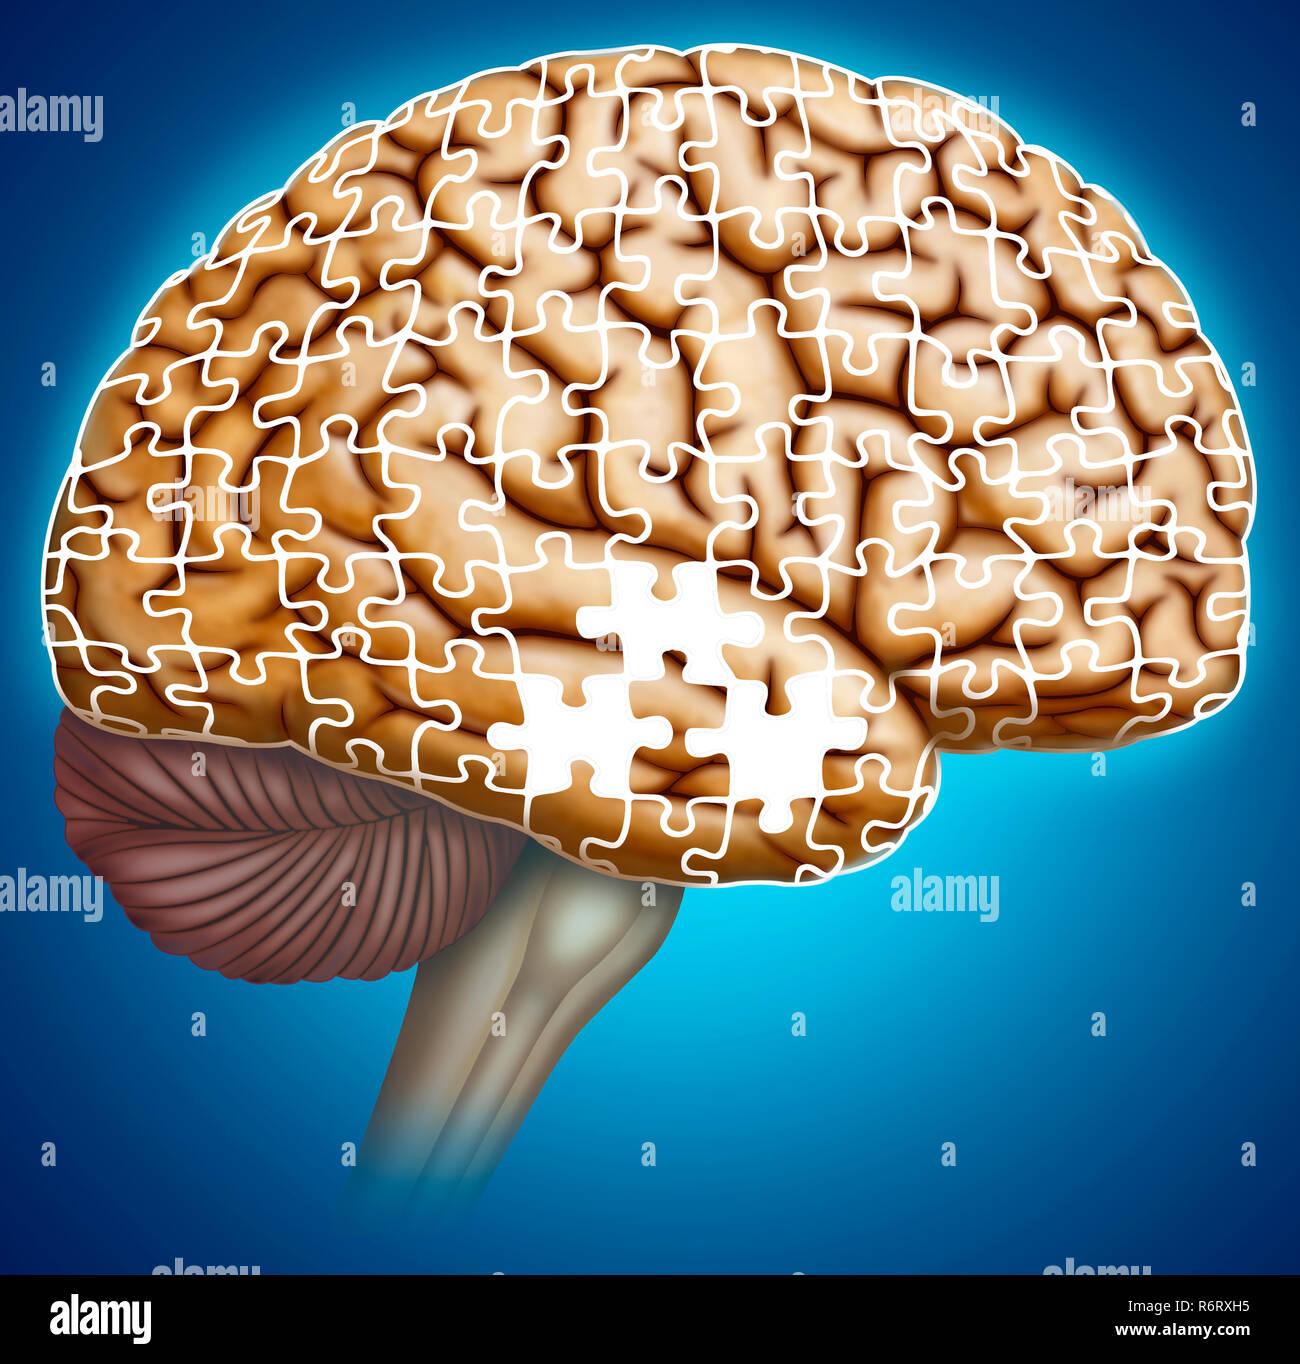 La memoria en la enfermedad de Alzheimer Foto Stock